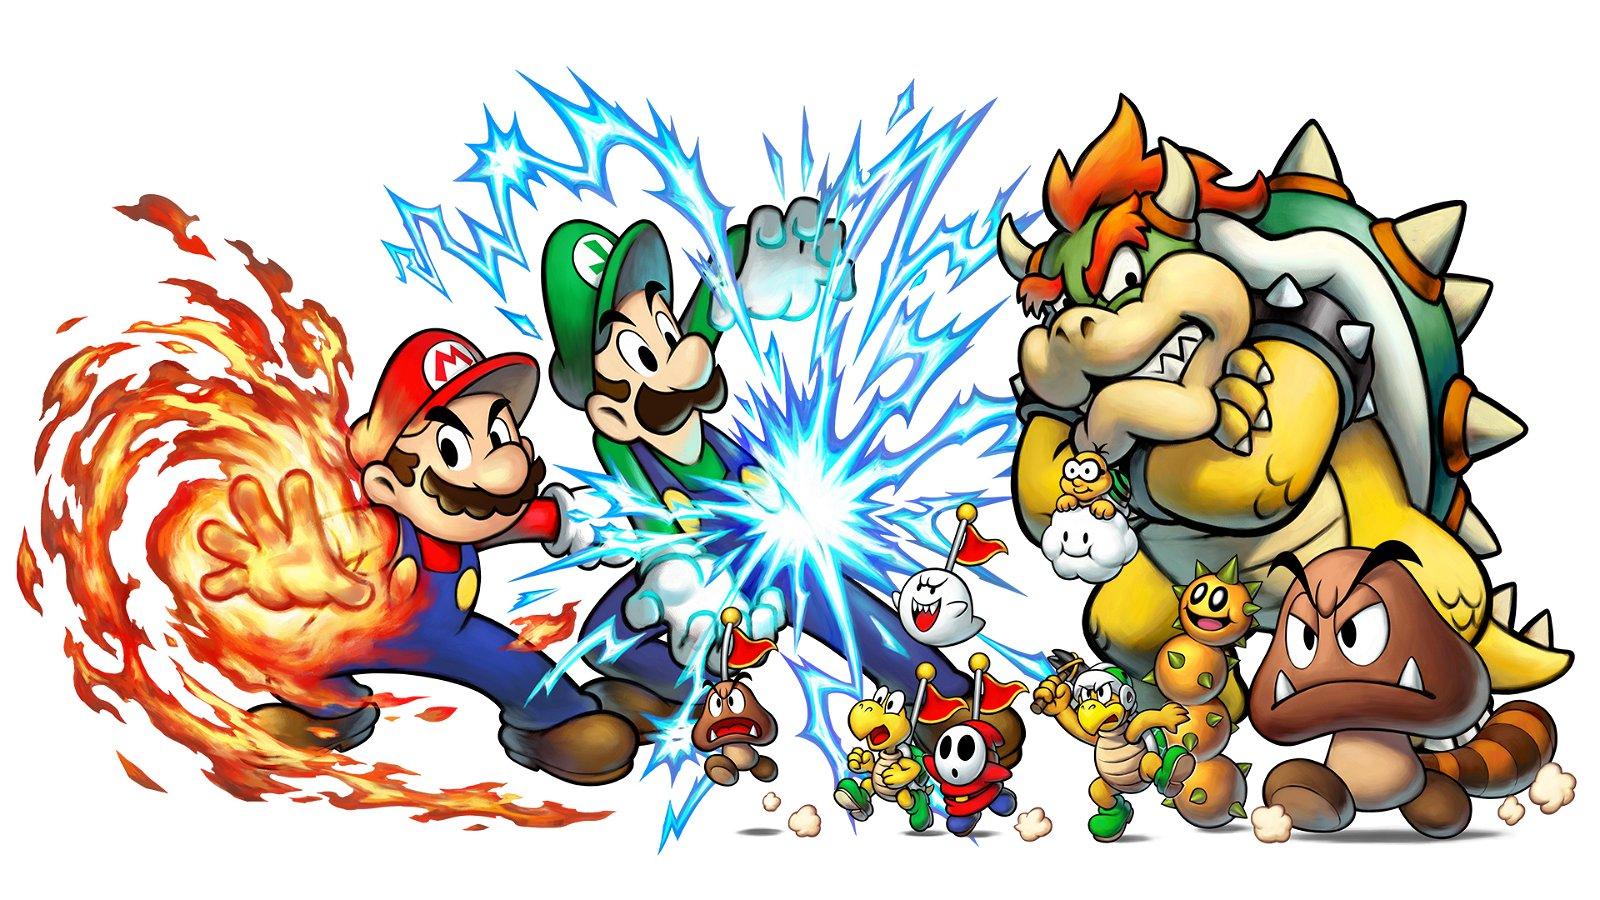 Mario and Luigi Superstar Saga + Bowser's Minions (3DS) Review: Nostalgia Value 4